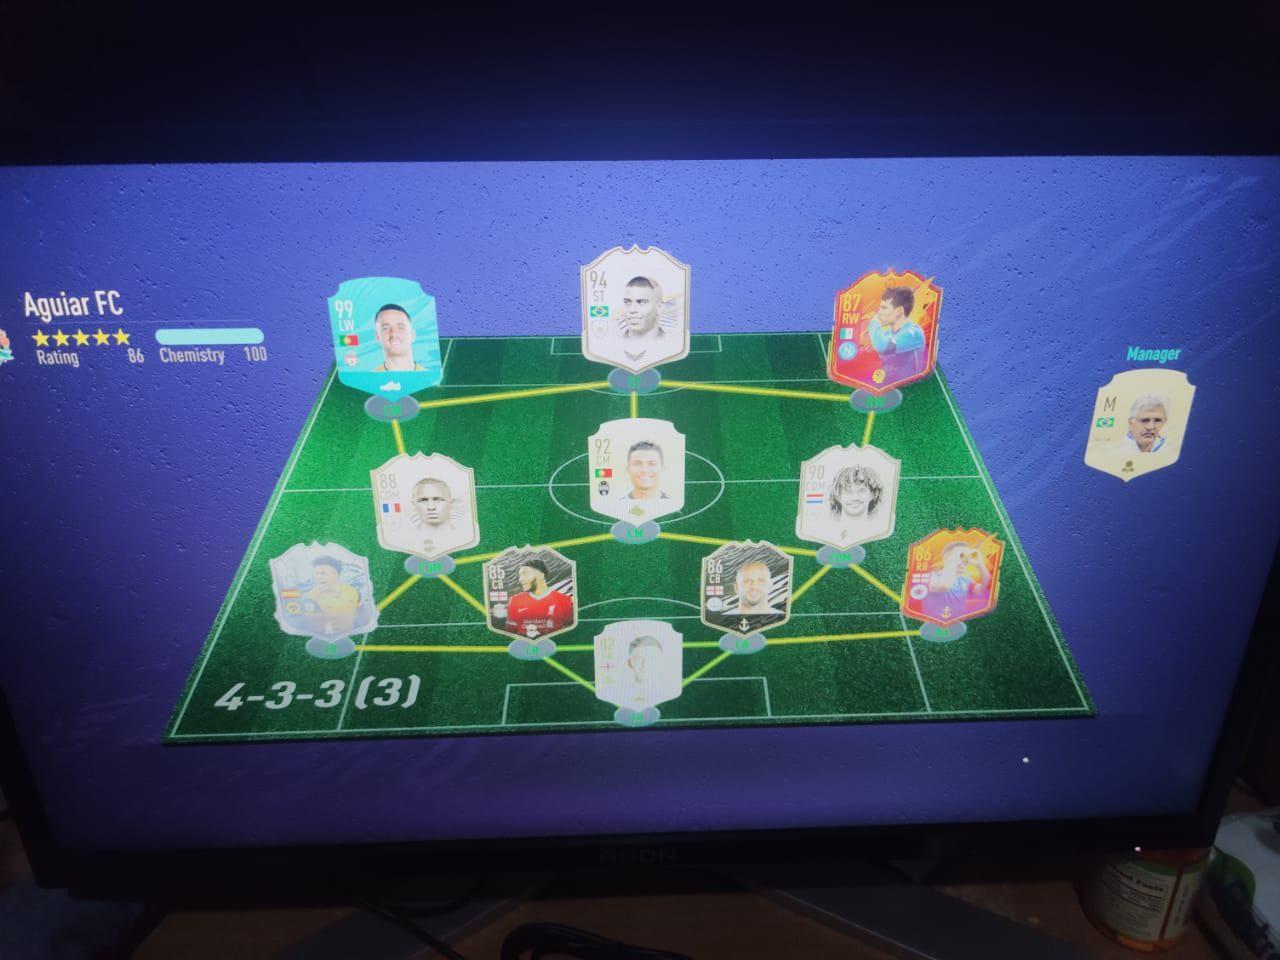 echipa lui diogo jota de la liverpool in fifa 21